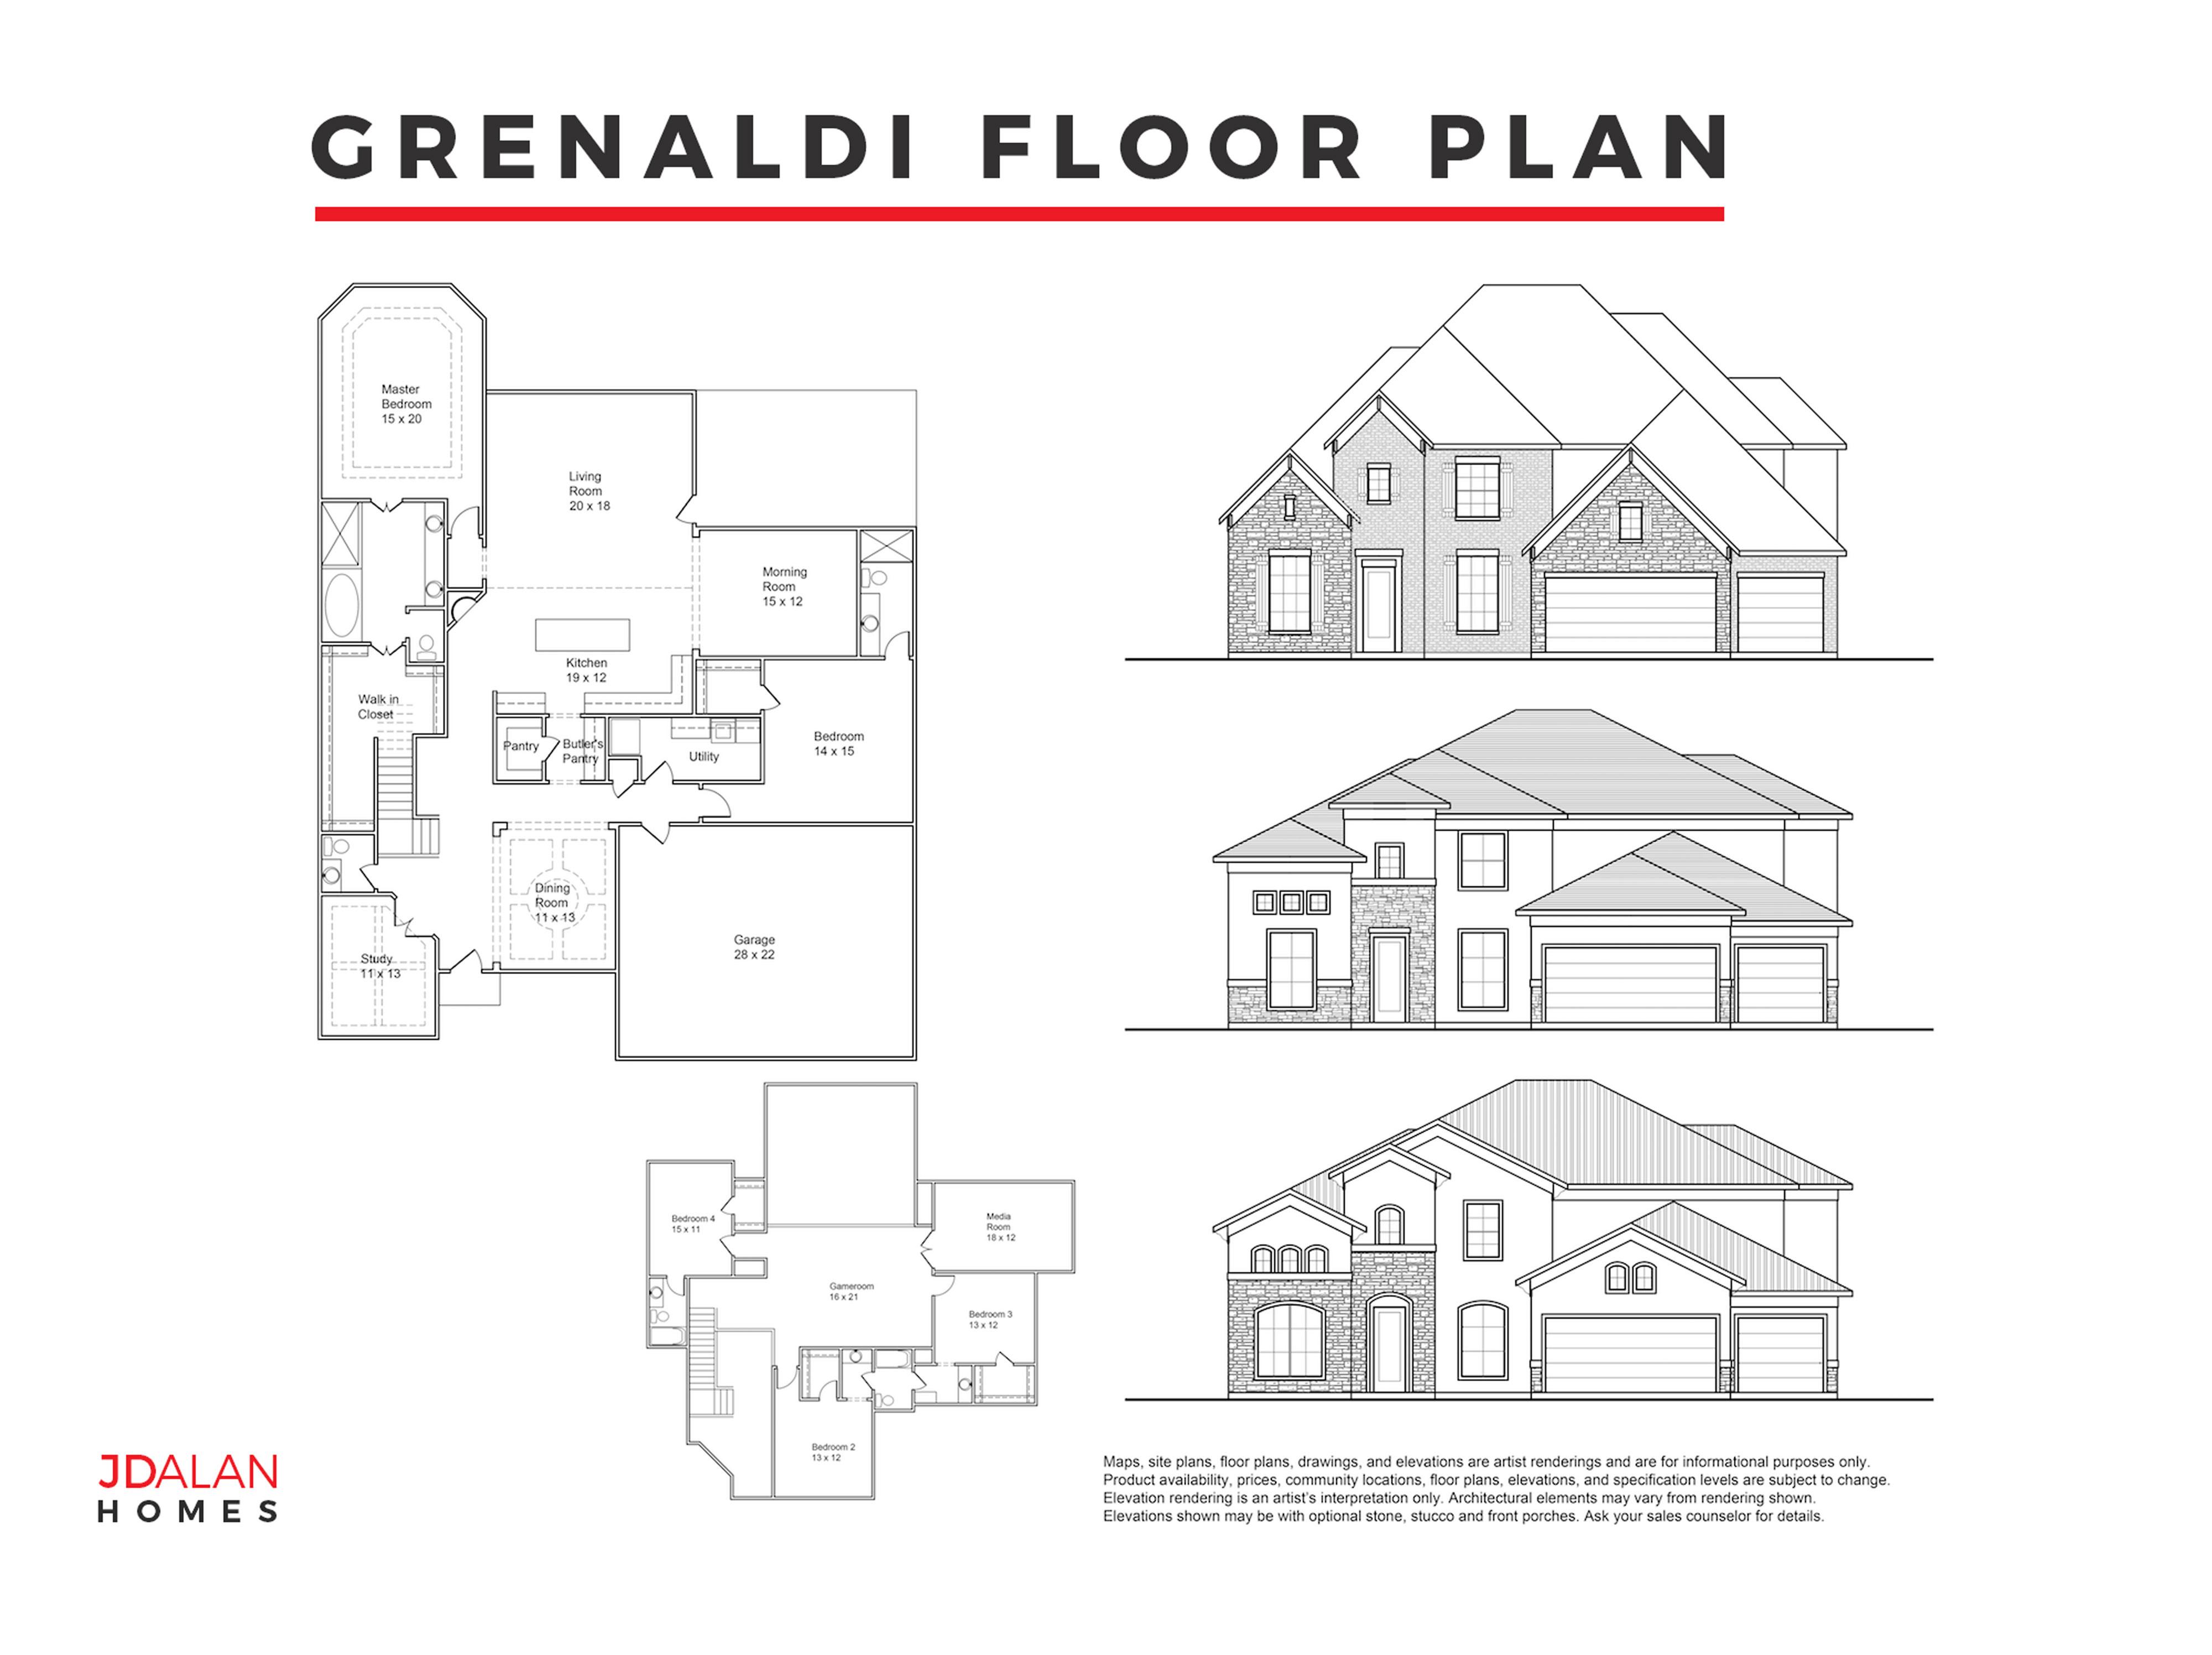 GRENALDI FLOOR PLAN #4211